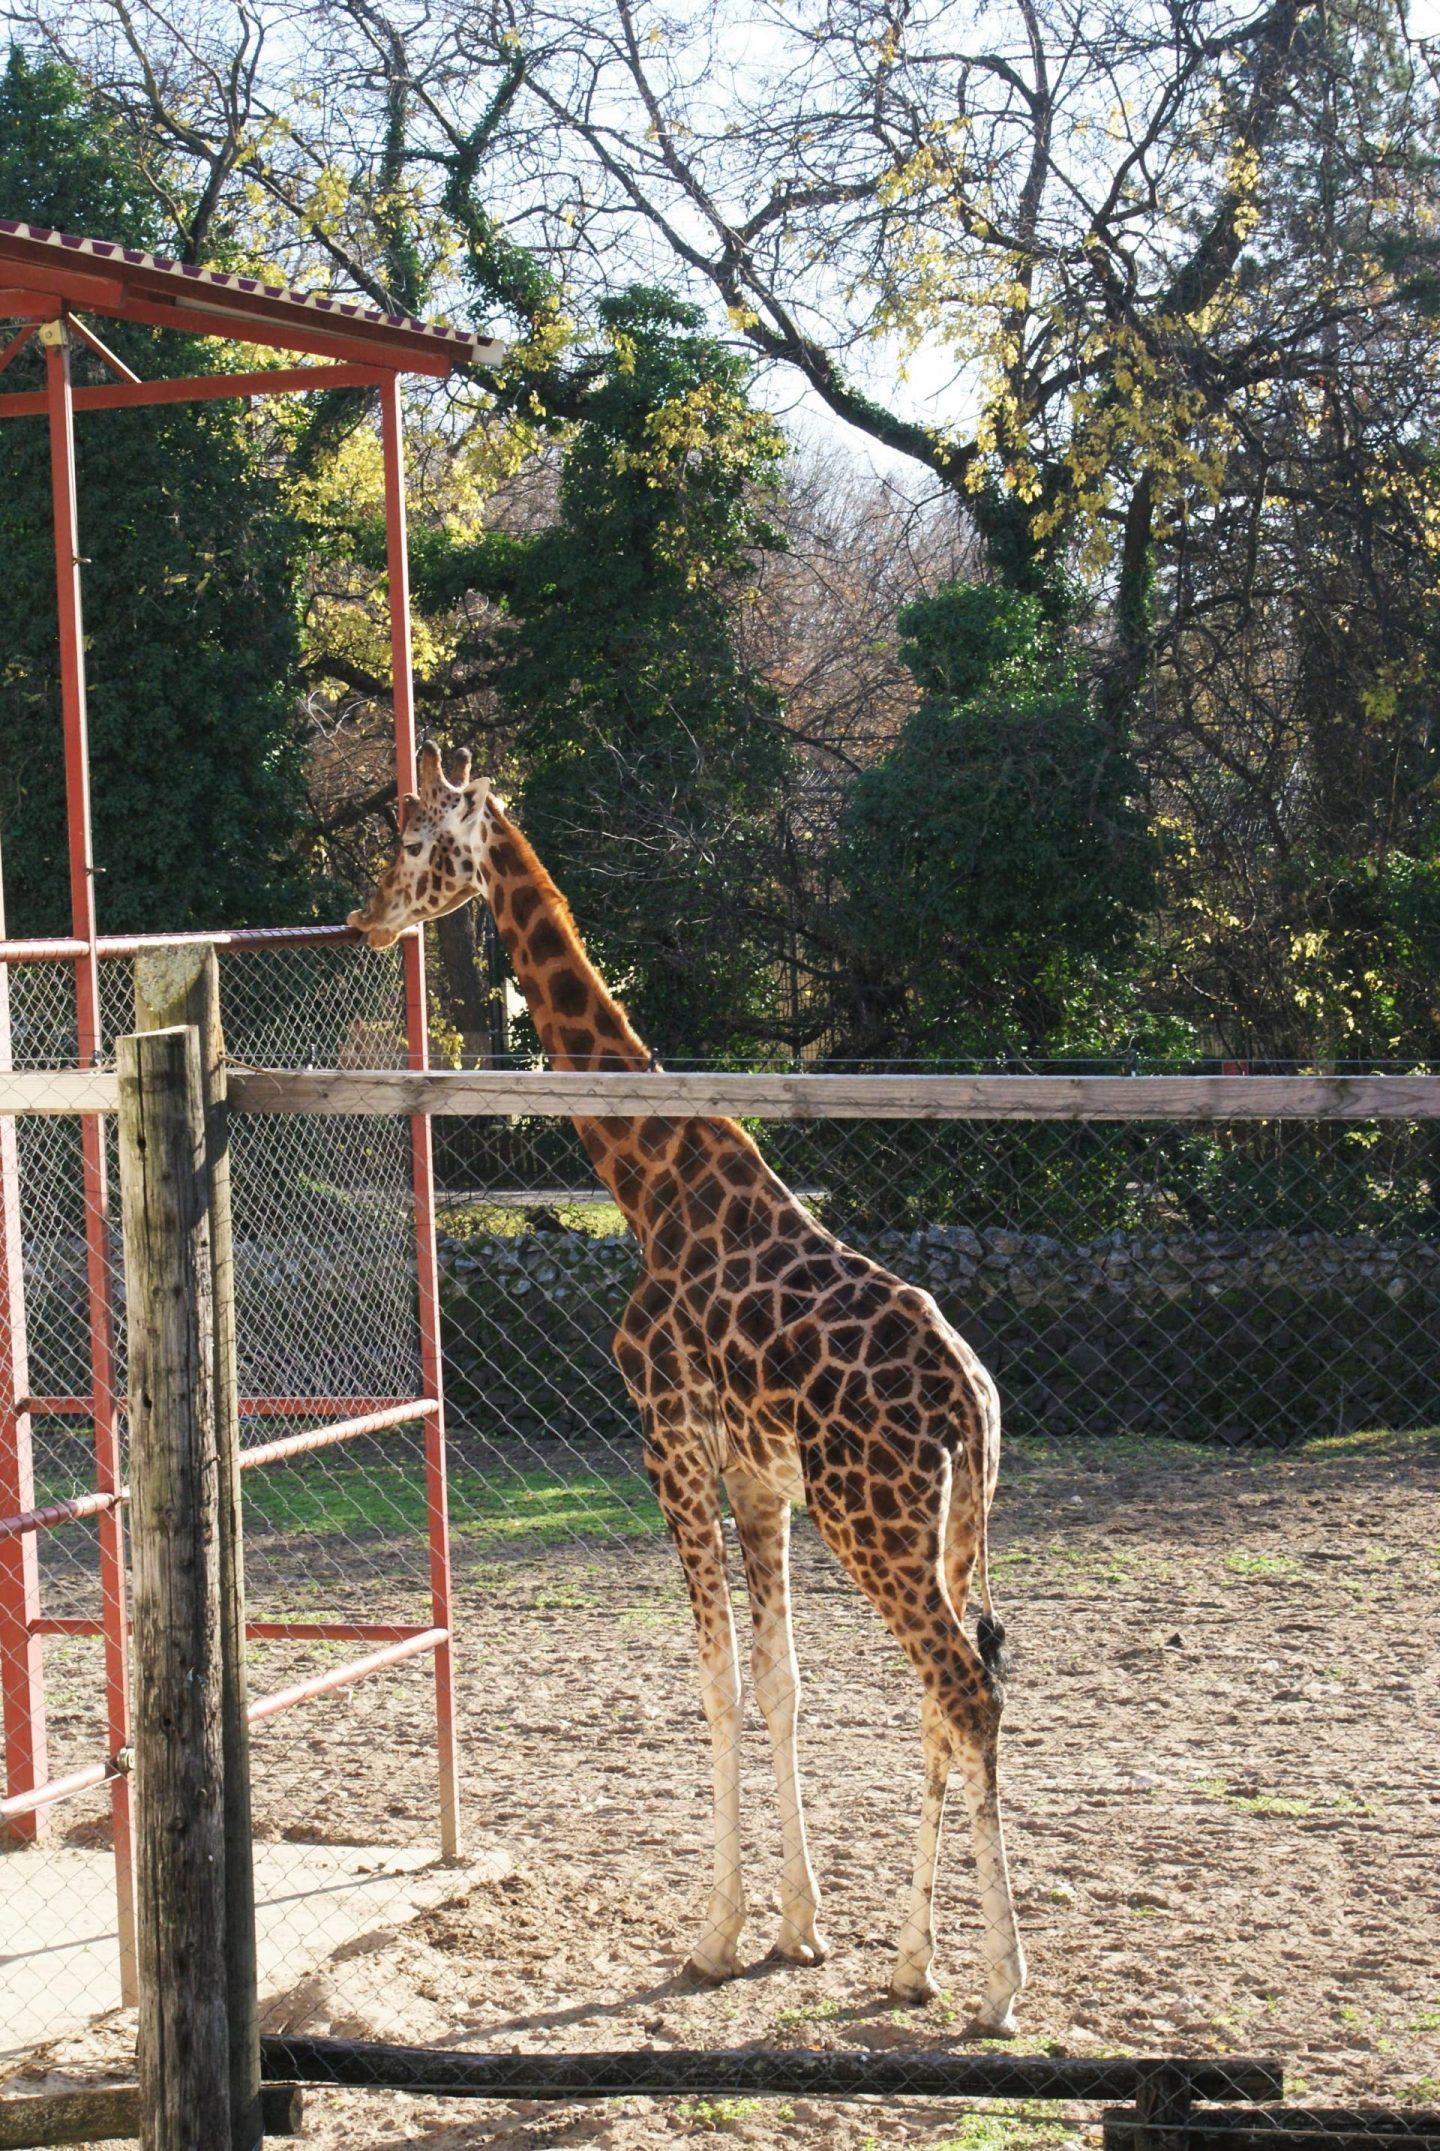 Žirafa u Zoo vrtu na Paliću © According to Kristina